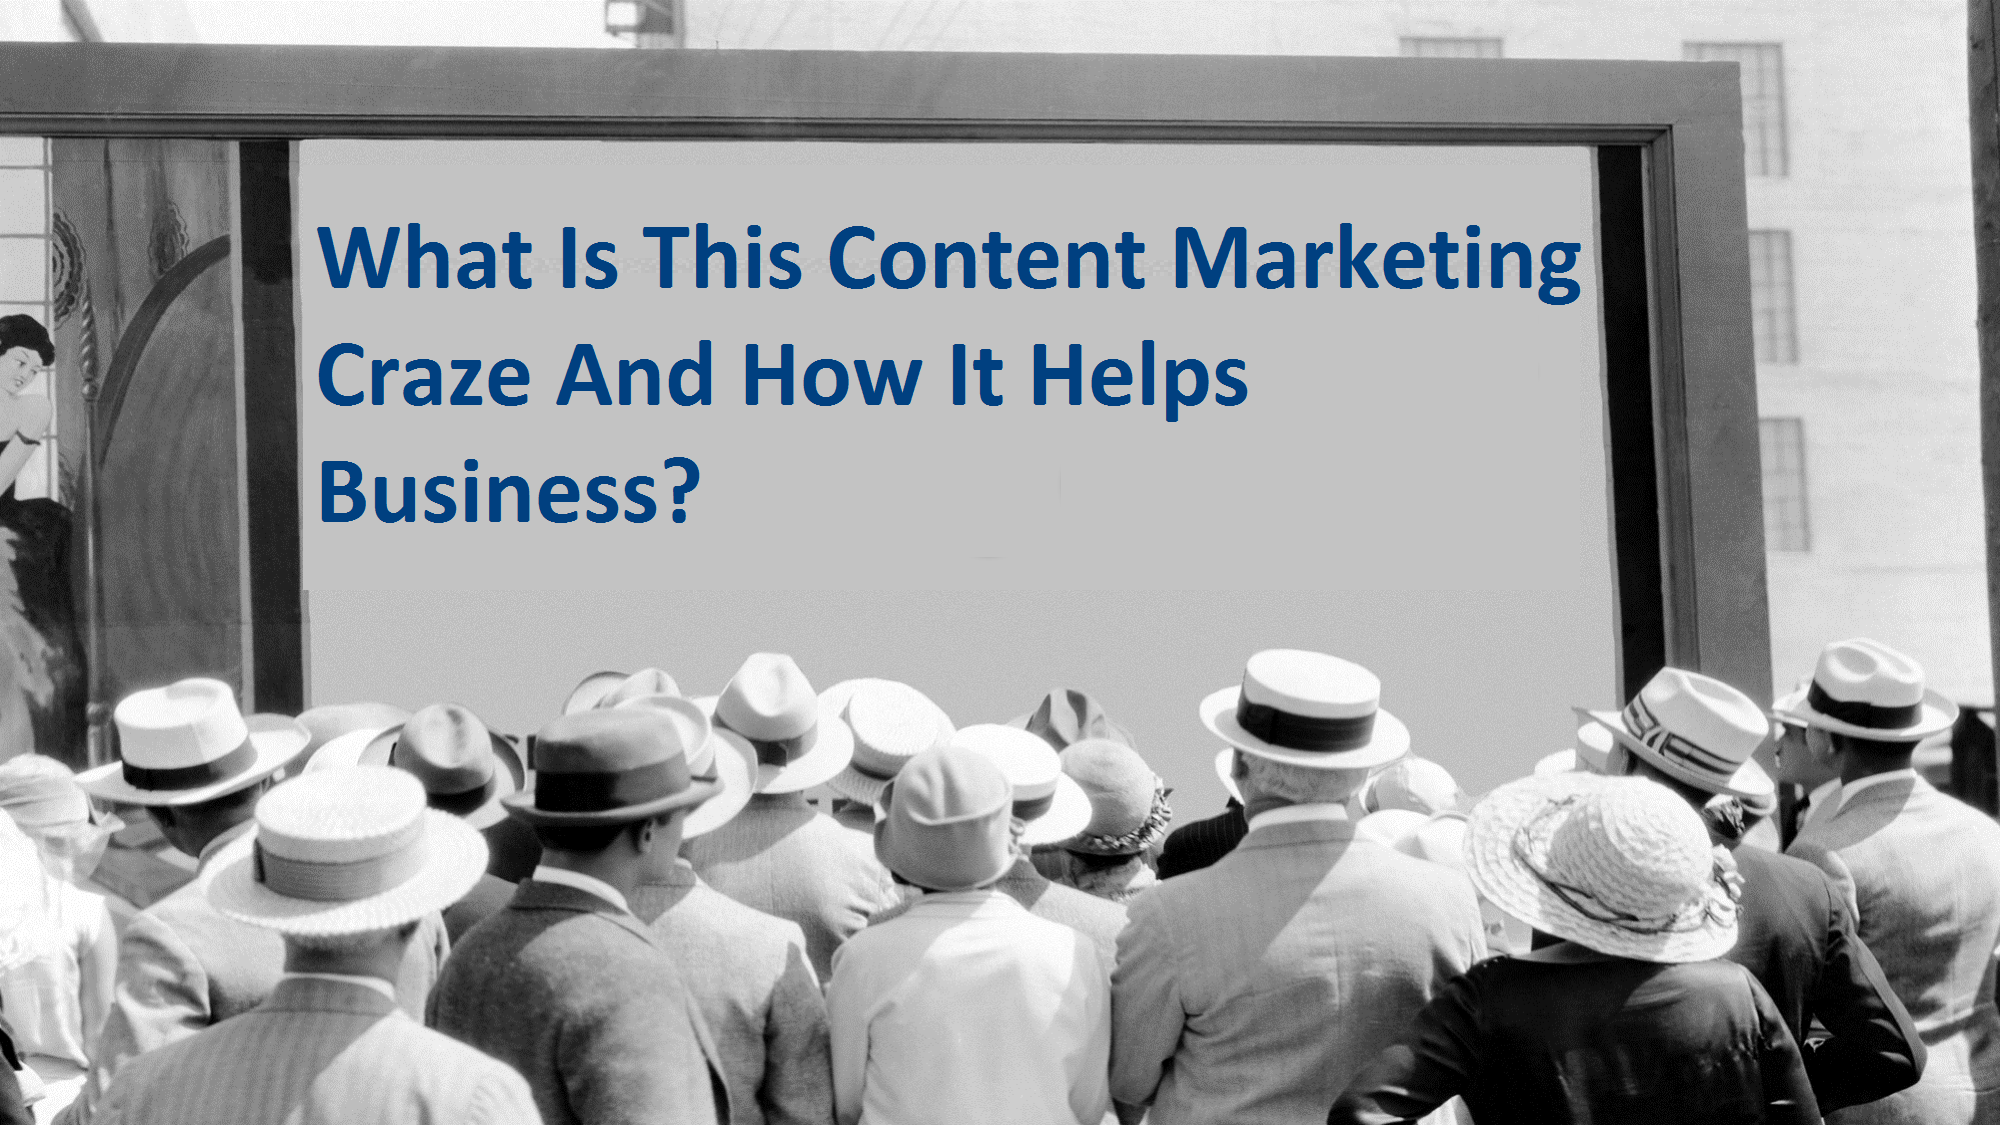 contentmarketingcraze-1